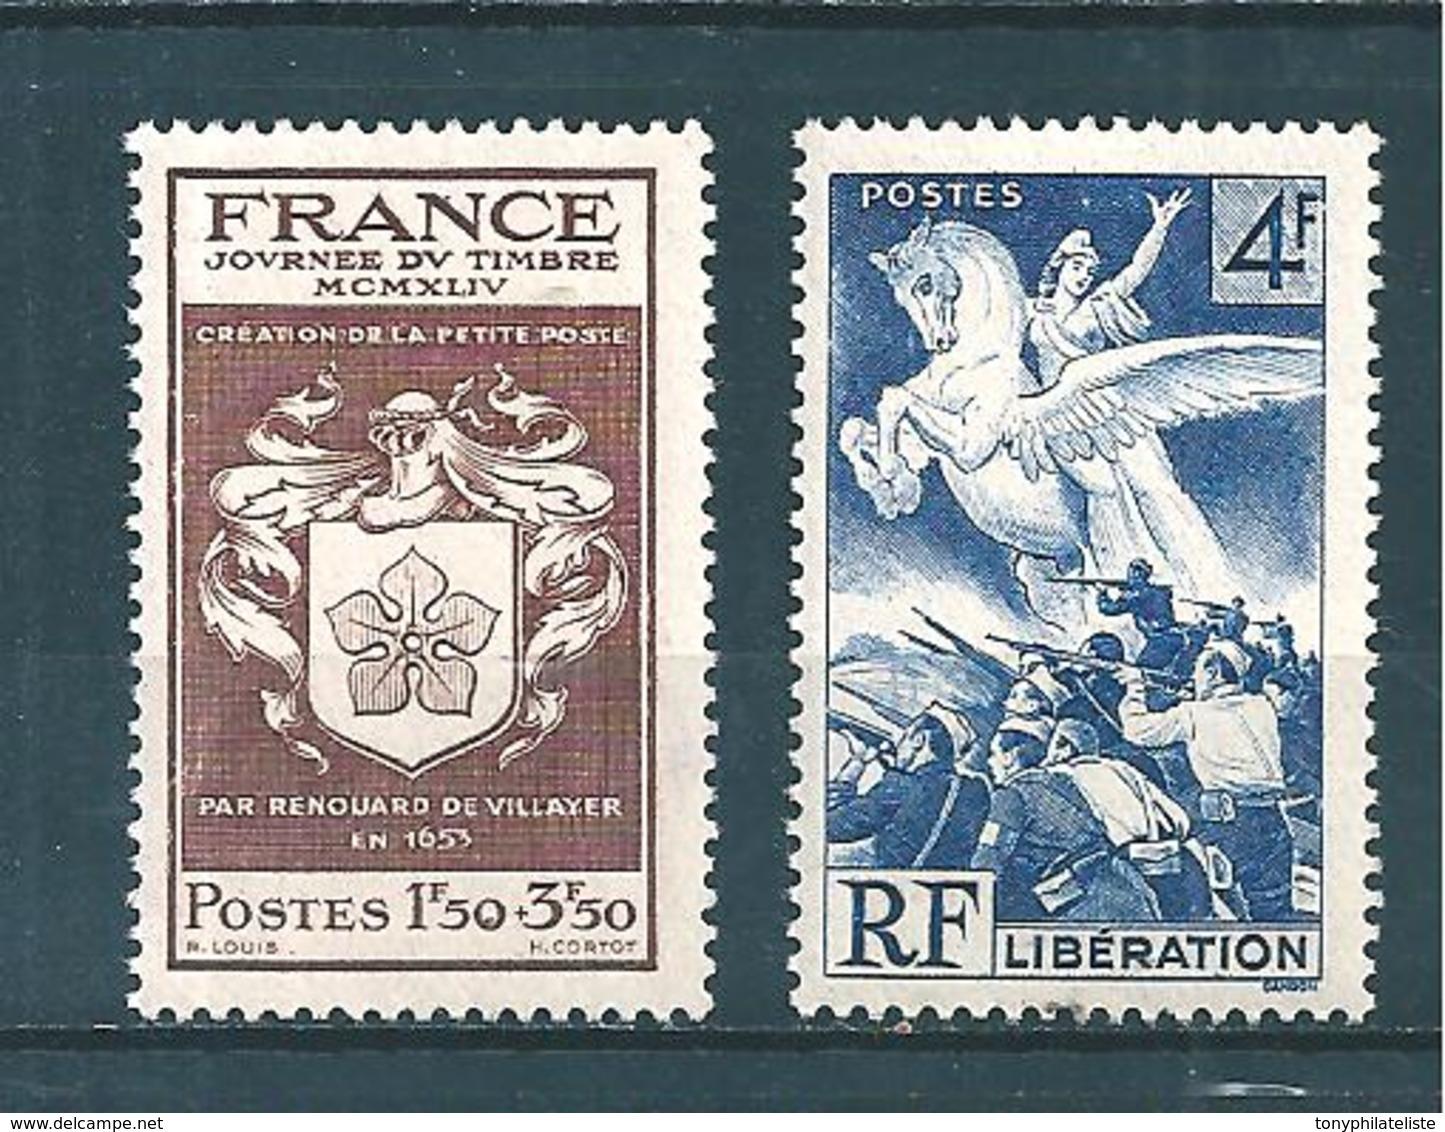 France Timbres De 1944/45  N°668 Et 669  Neuf ** Sans Charniére - France